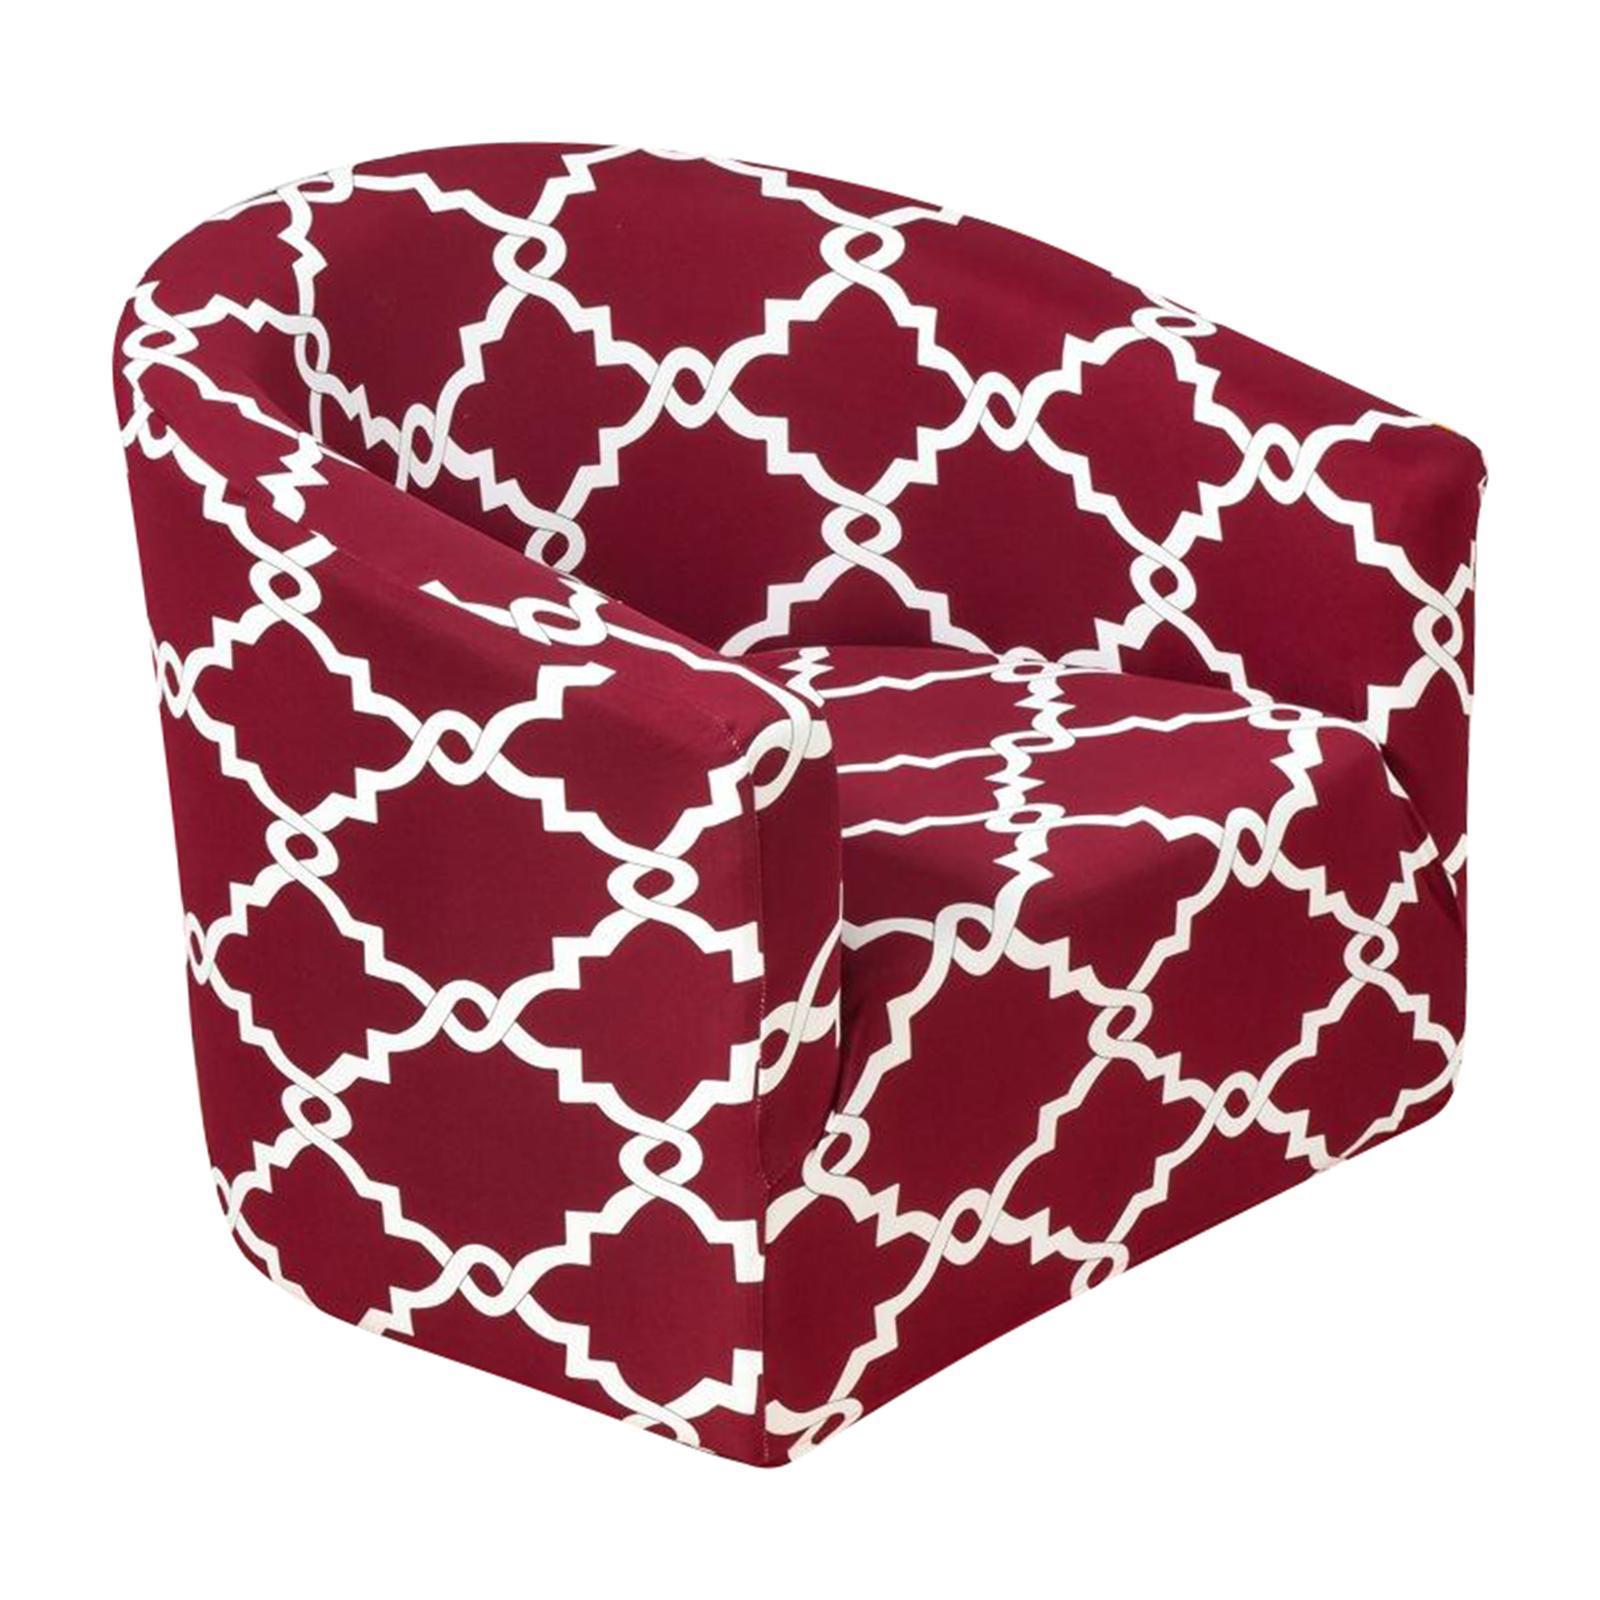 miniatura 6 - Fodera per poltrona singola per poltrona Fodera per sedia in colori assortiti